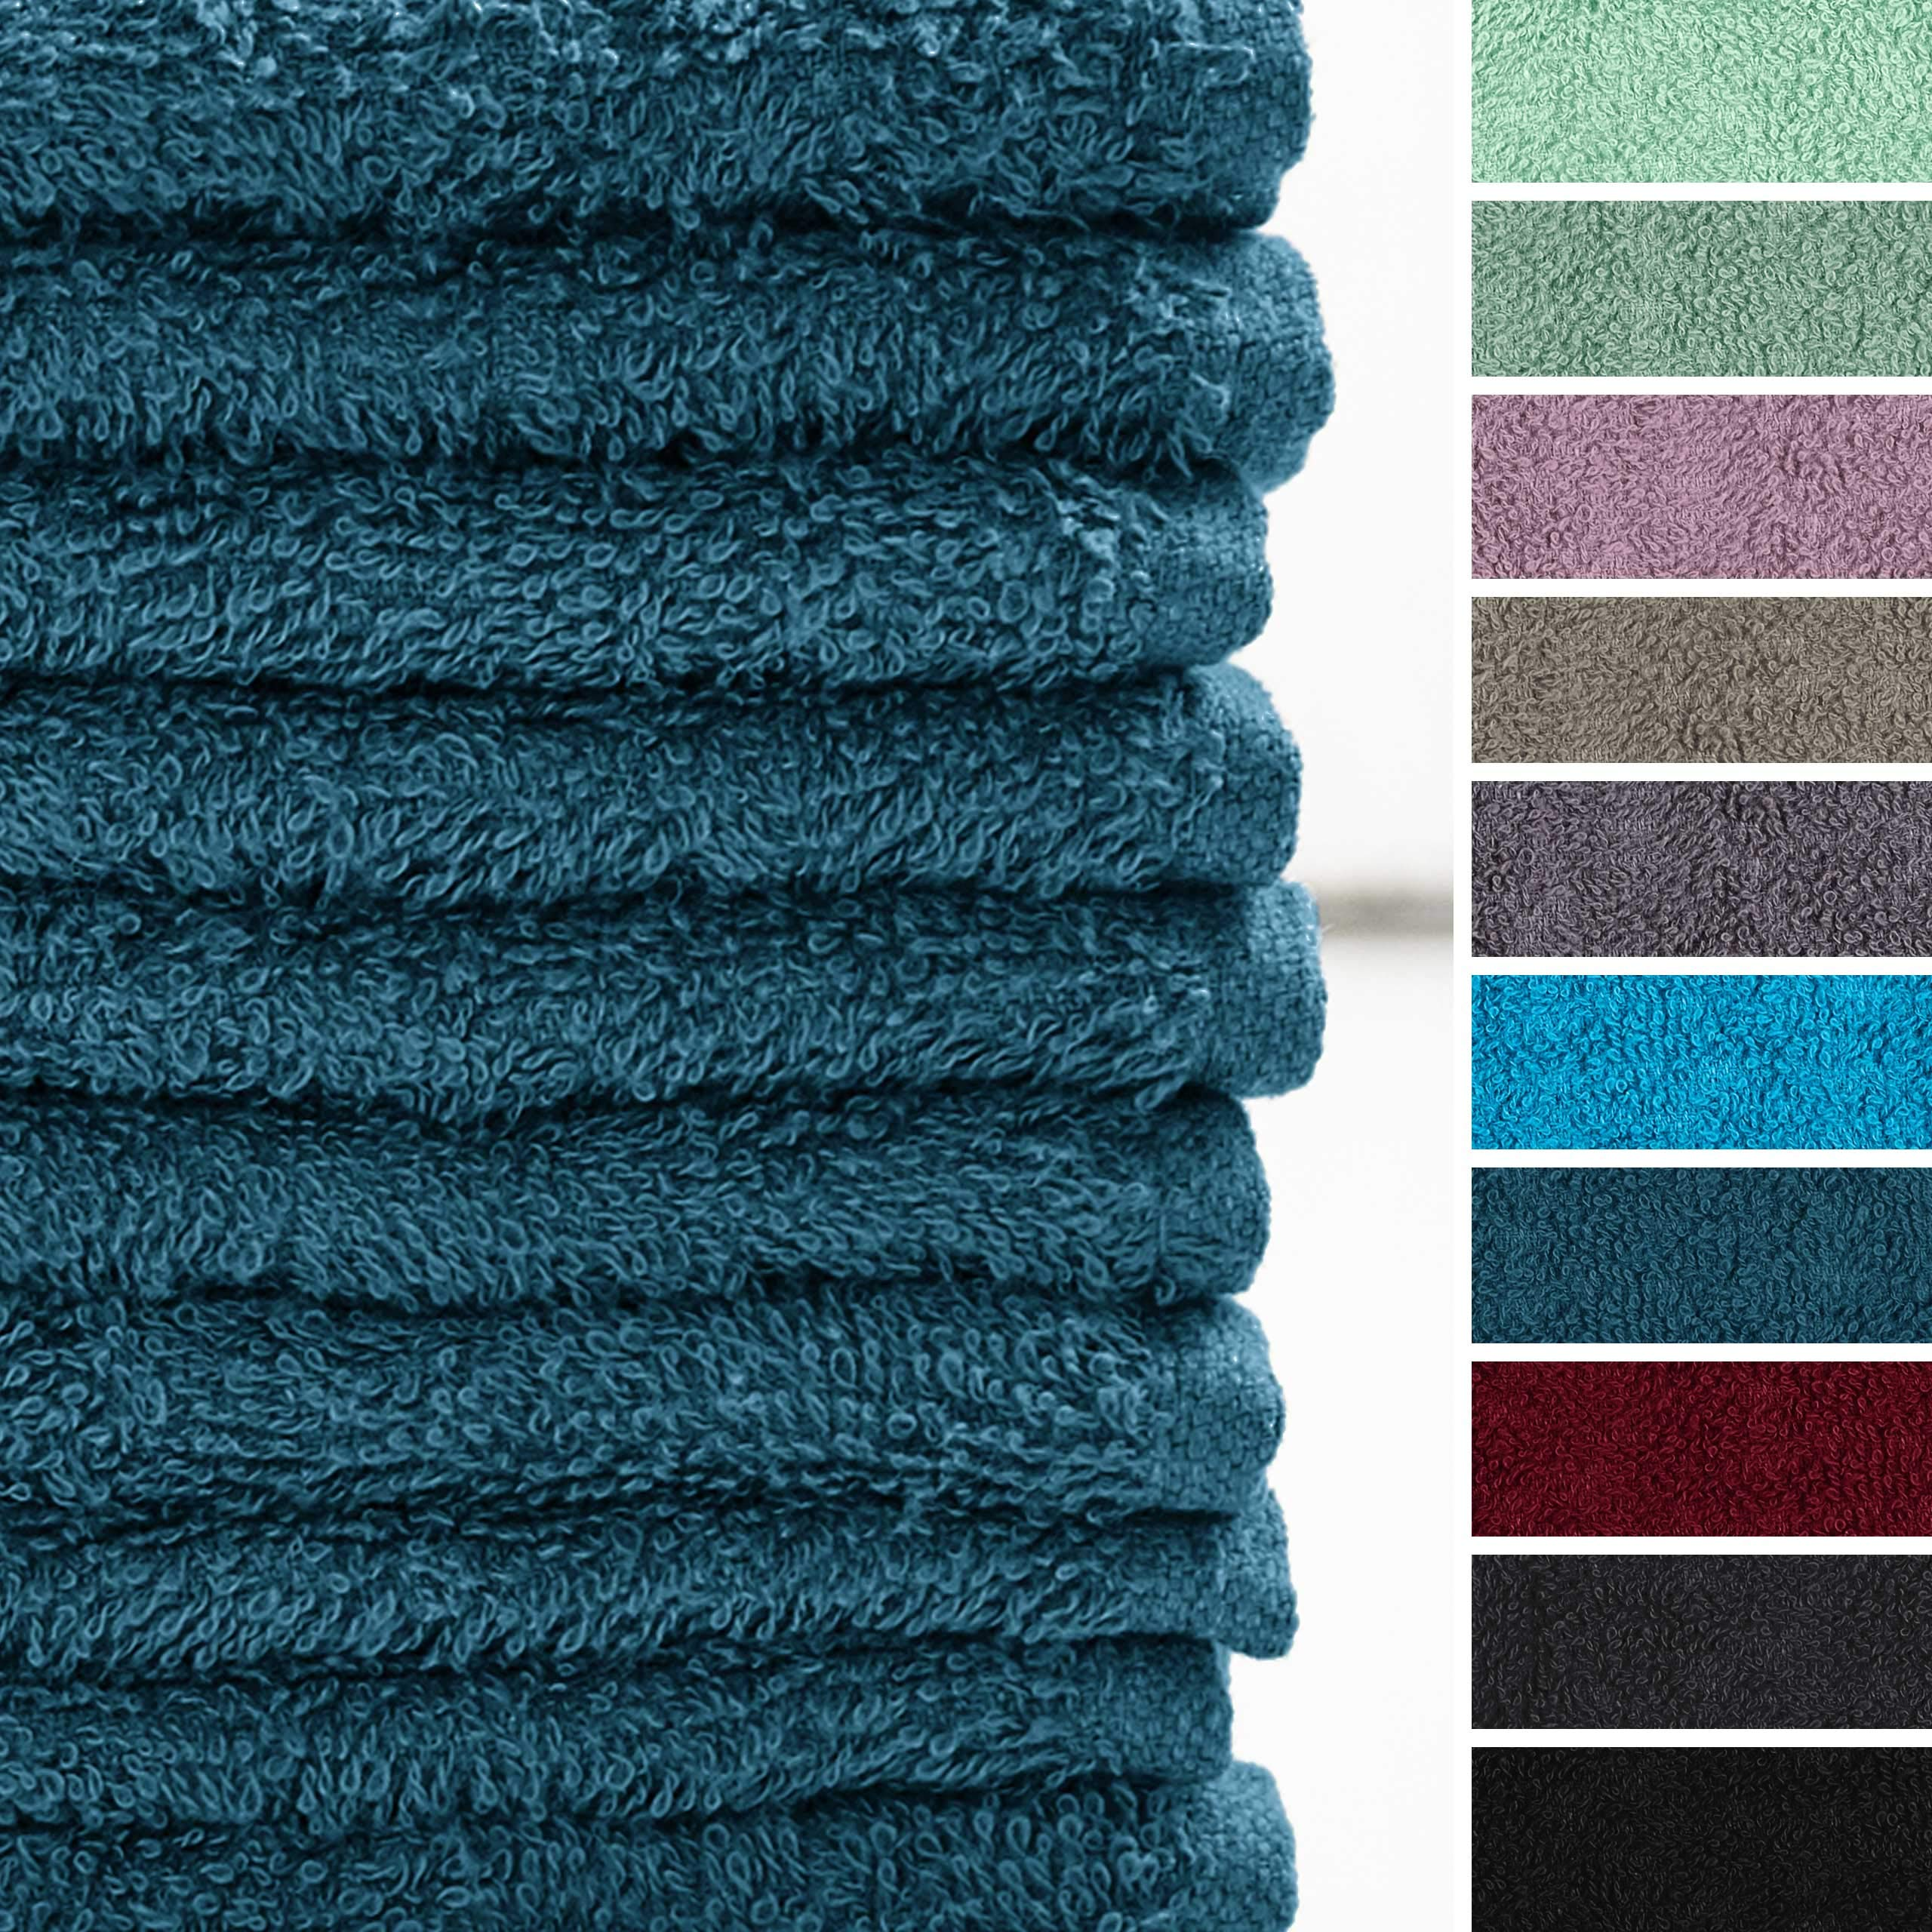 Lumaland Premium Set 10 Toallitas Suaves bidet30 x 30cm 100% algodón 420 g/m²